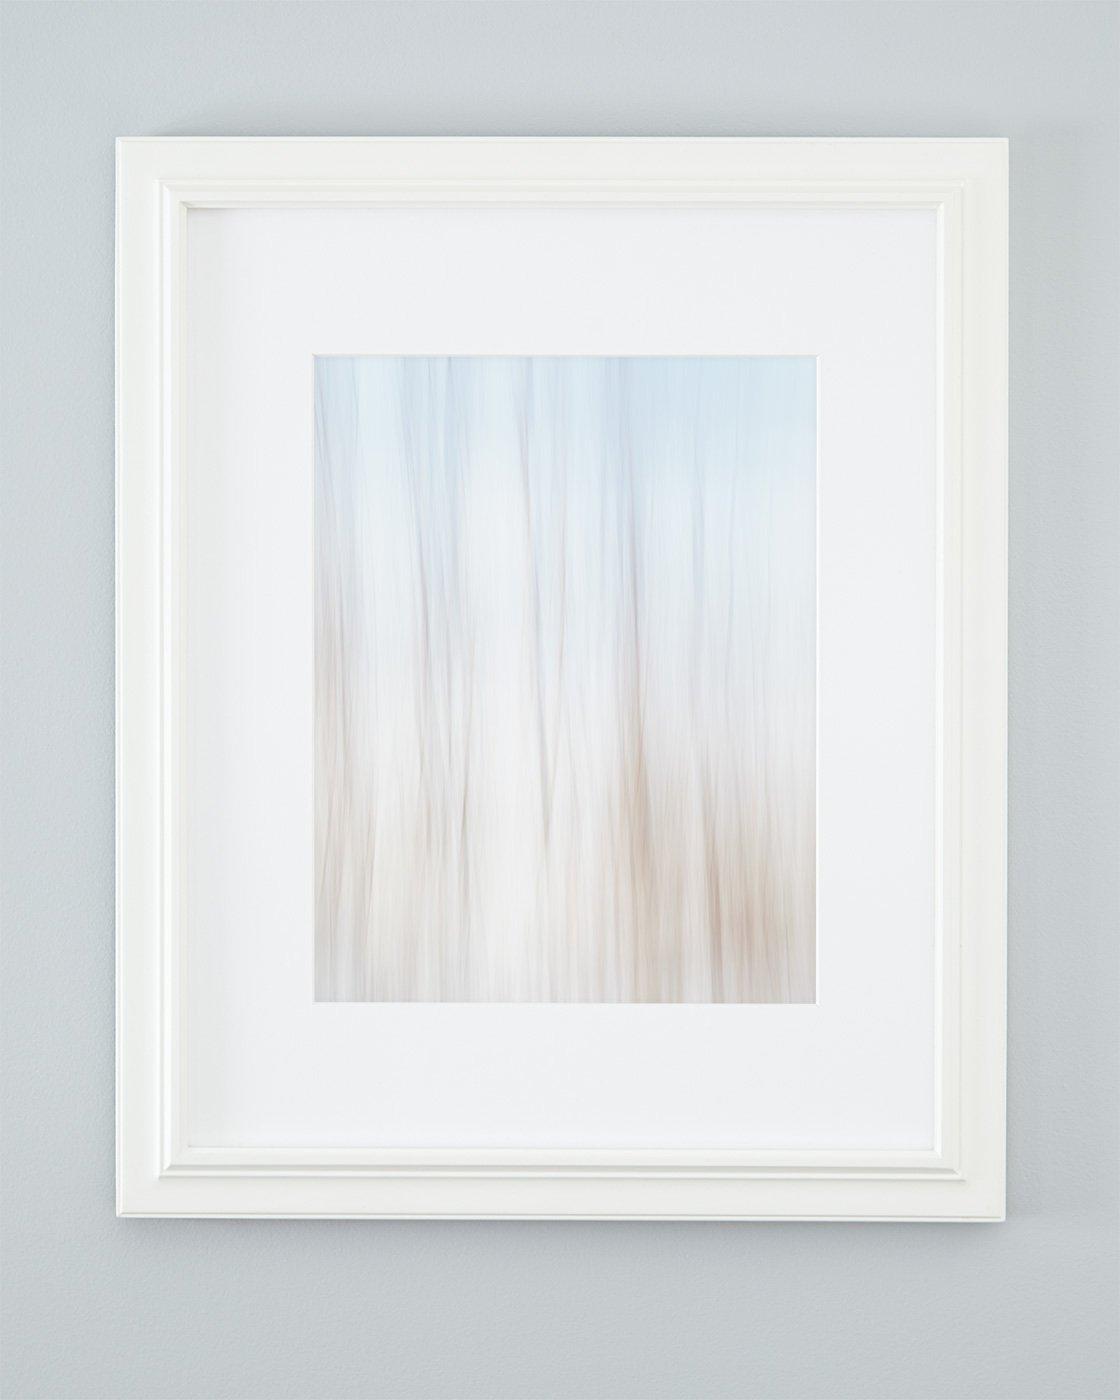 Coastal Modern Decor - Melt Away - Framed